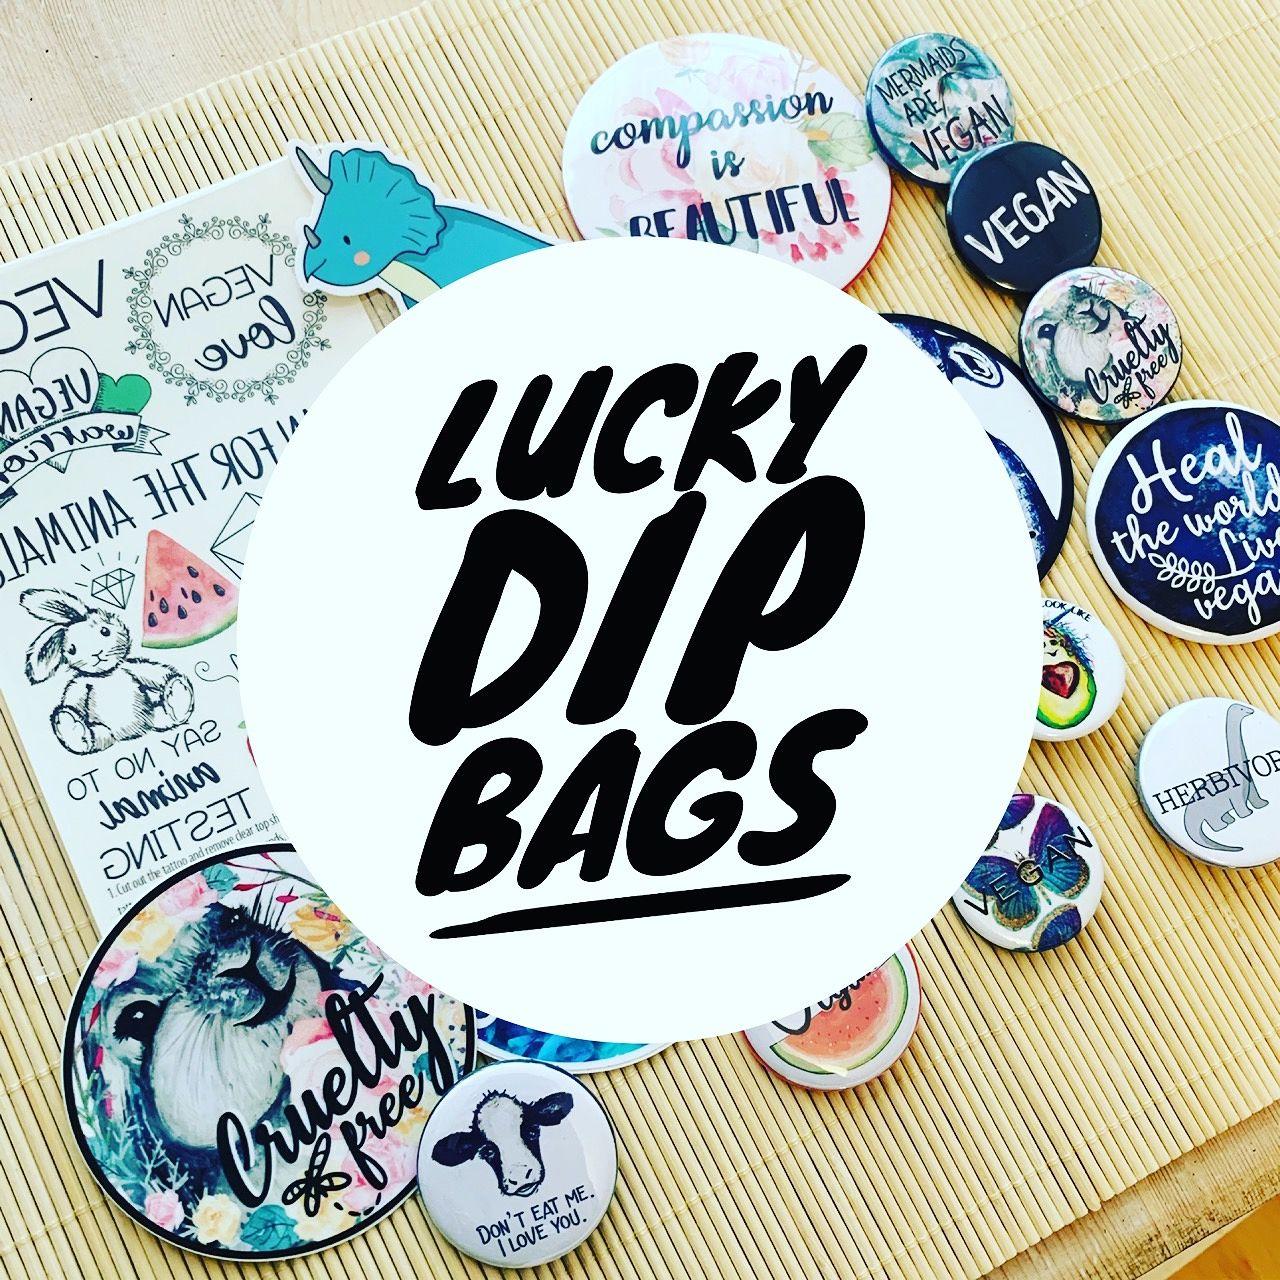 Lucky Dip Bags